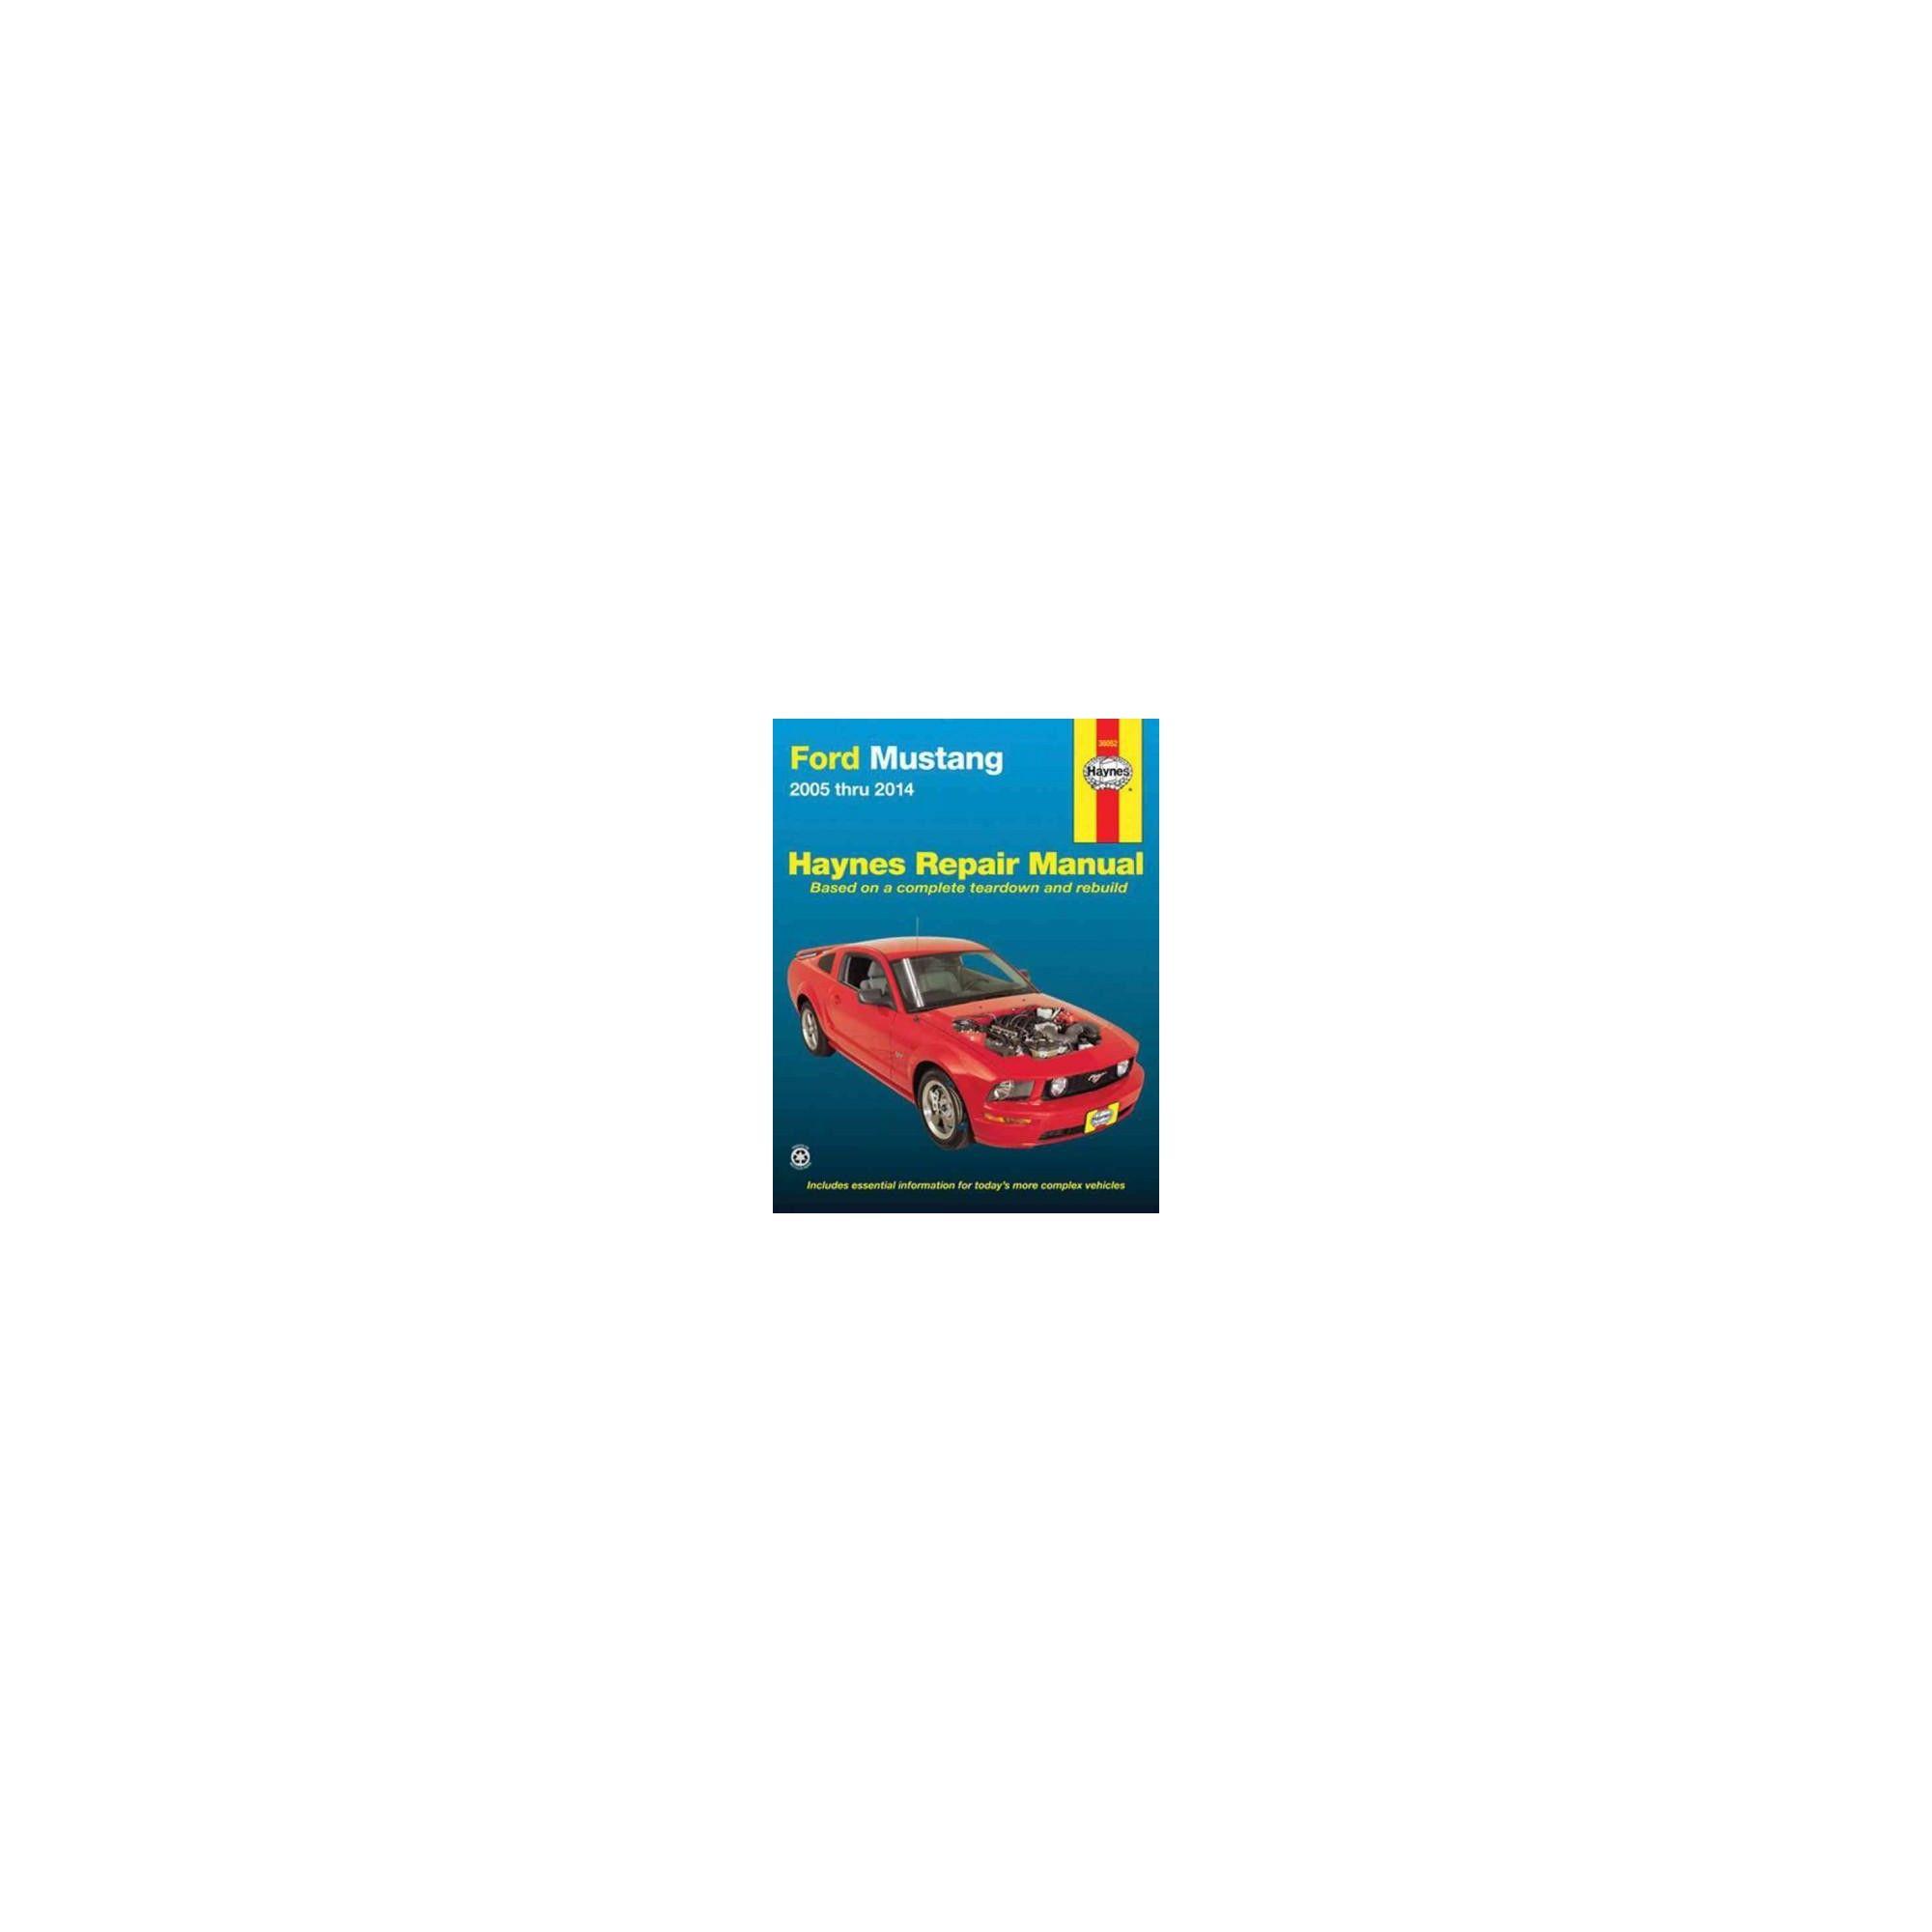 Onkyo s3300 manual ebook array manitou mt 1840 manual ebook rh manitou mt 1840 manual ebook tempower us fandeluxe Images